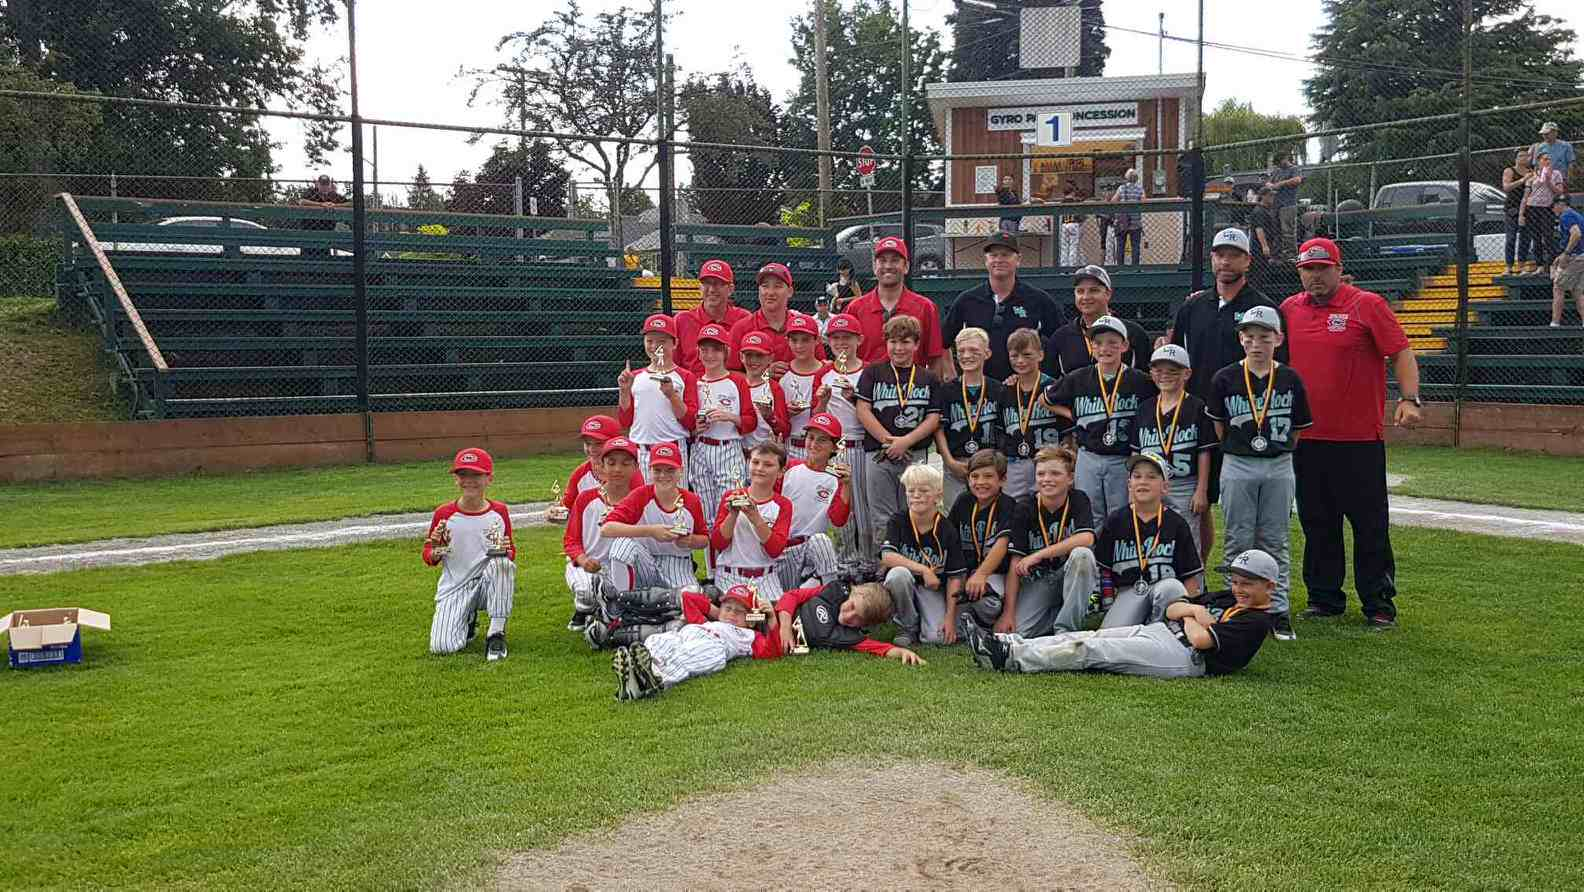 CSLL 8-10 tournament team wins at Nanaimo